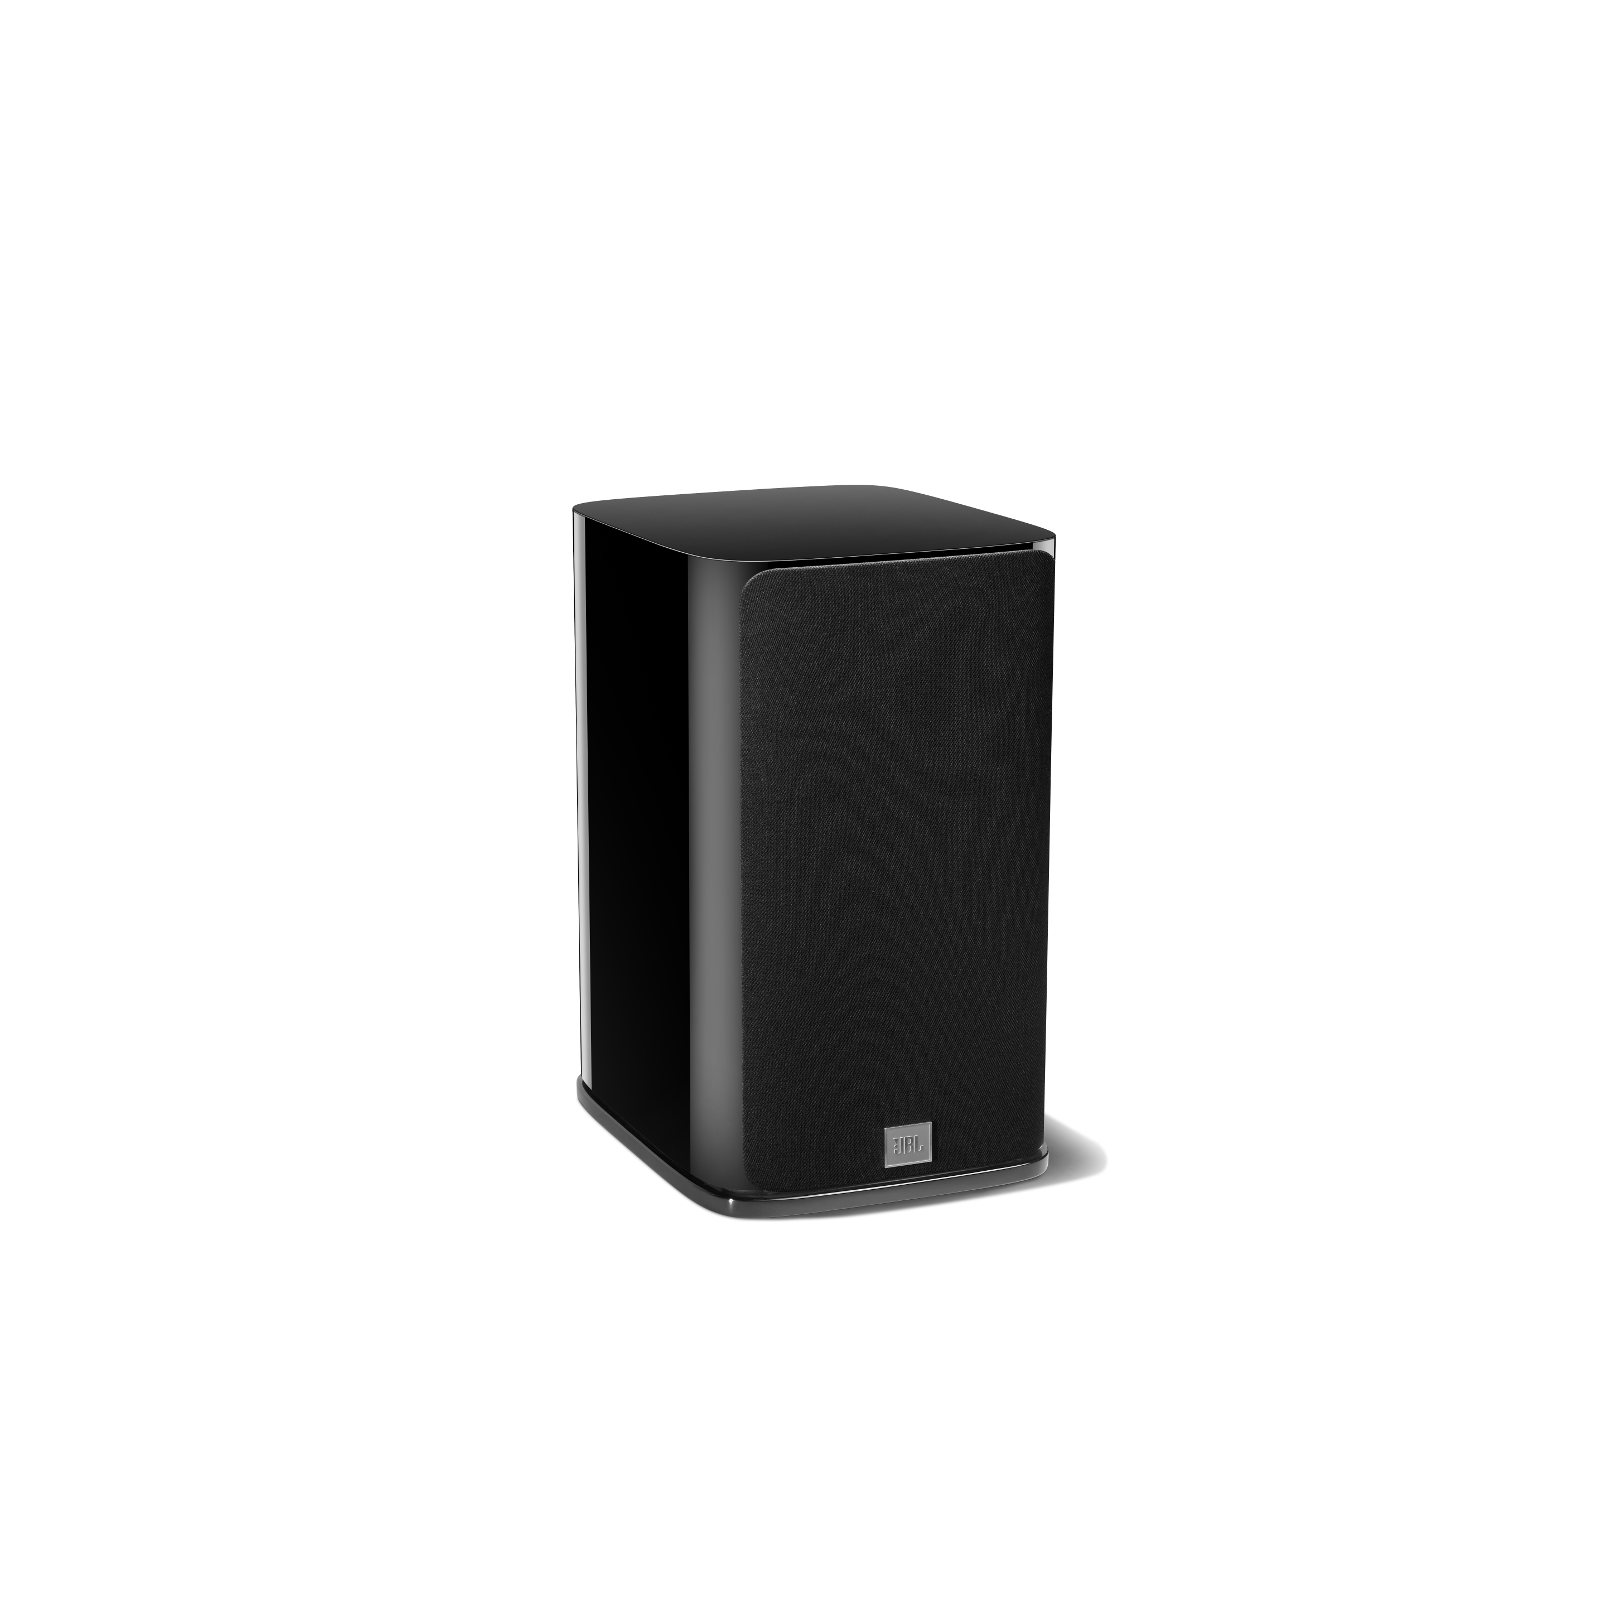 HDI-1600 - Black Gloss - 2-way 6.5-inch (165mm) Bookshelf Loudspeaker - Front